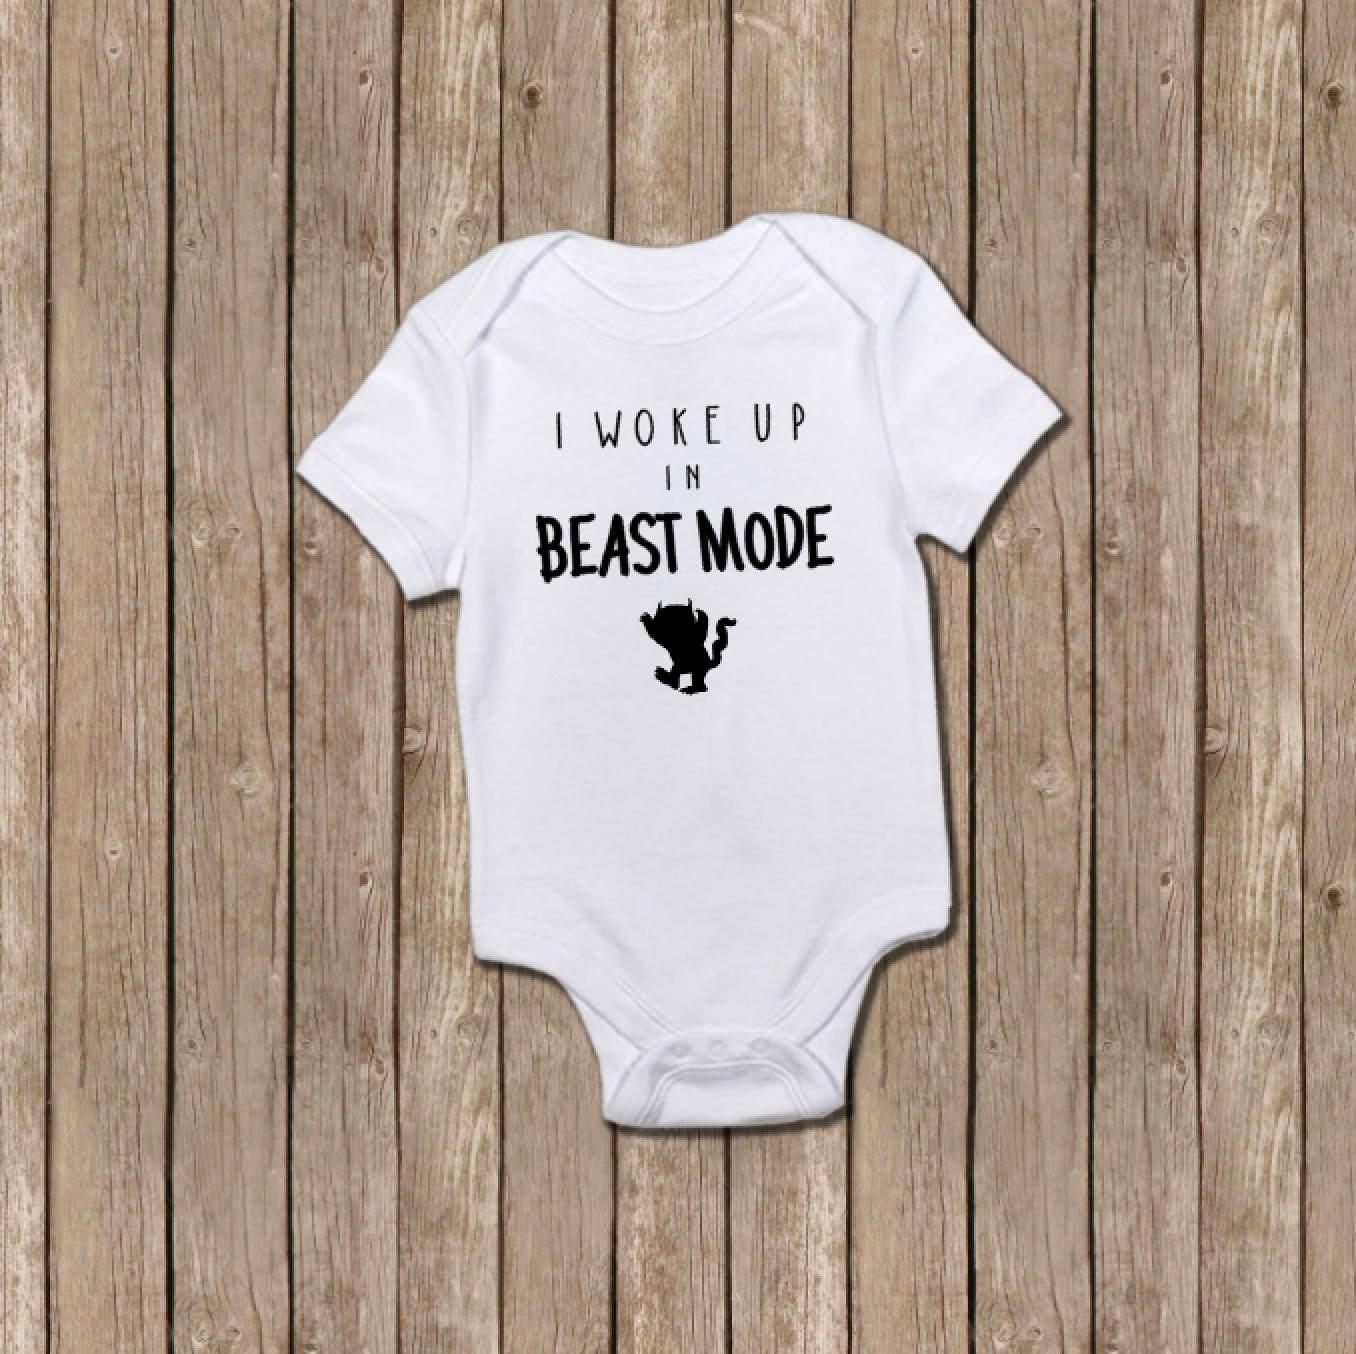 Love You in Korean Sarang Haeyo Txt Pen Baby Bodysuits Sleeveless Black6 Months